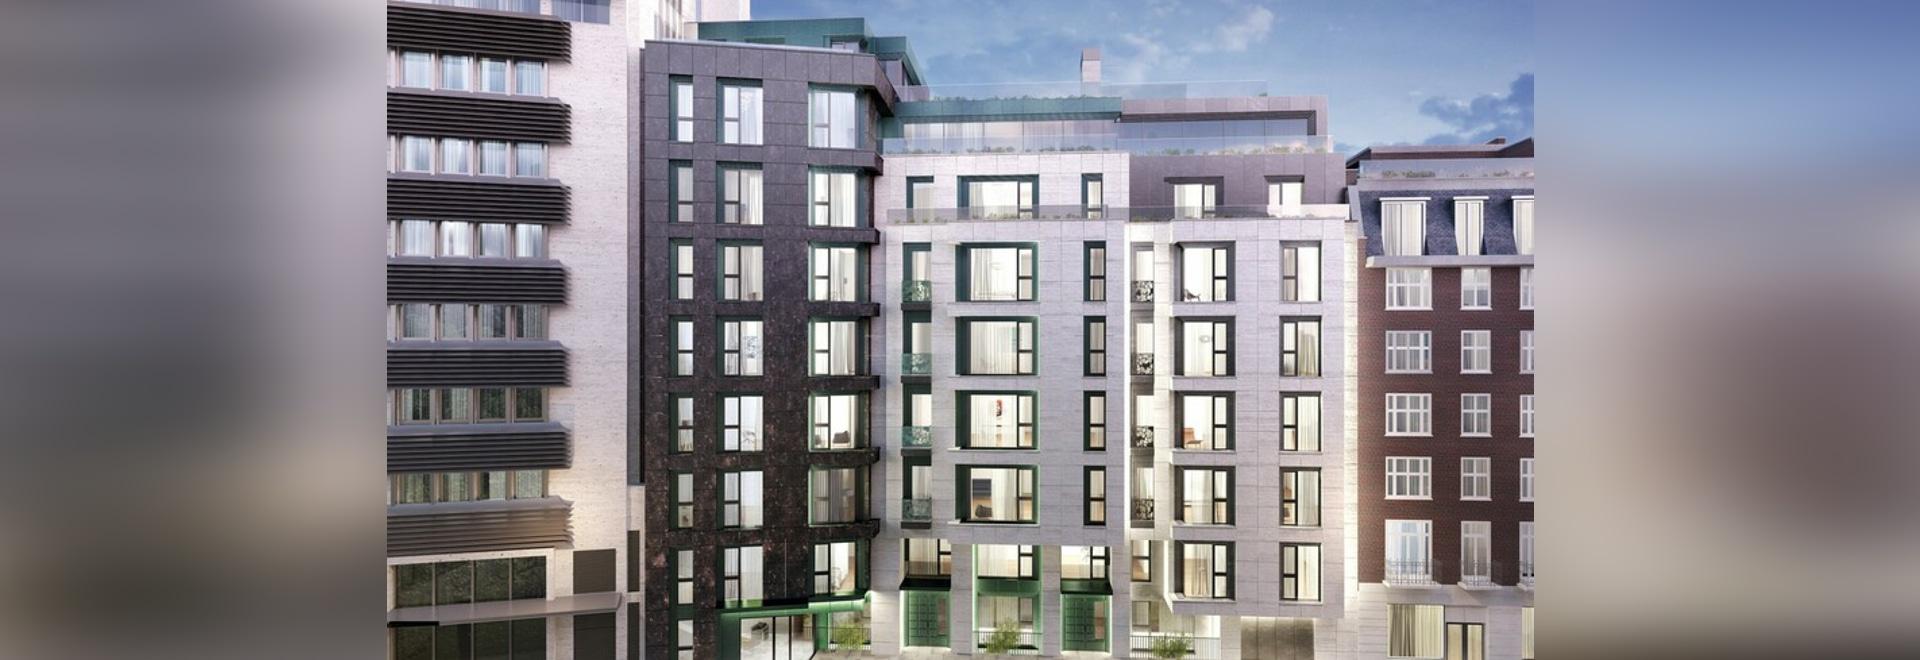 Mayfair Park Residences - Londres